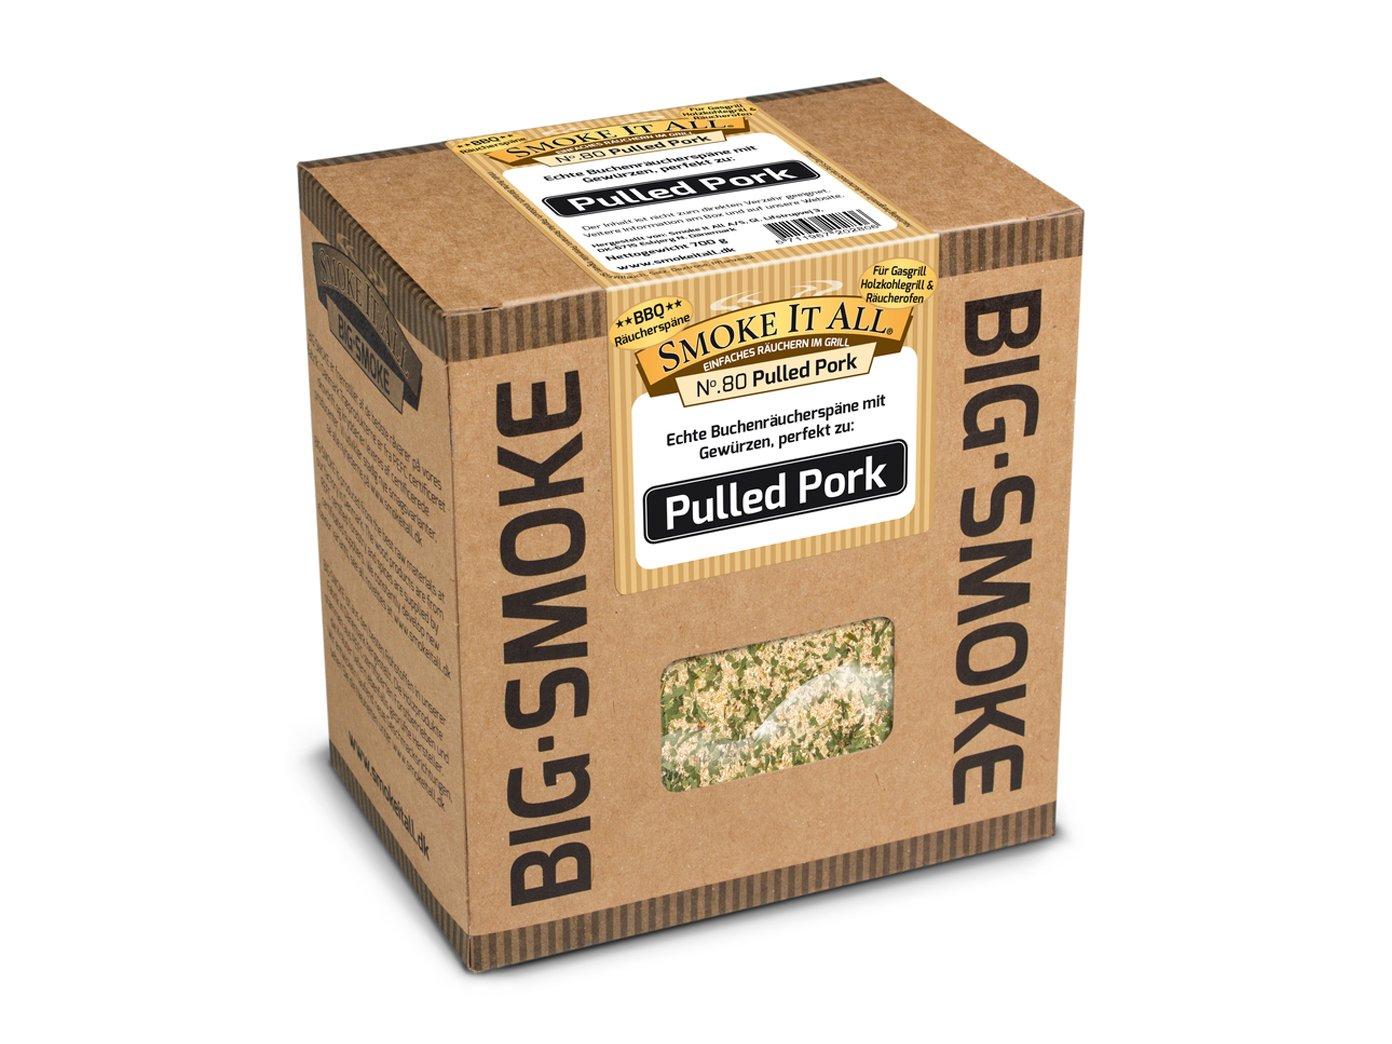 SMOKE IT ALL BBQ  Pulled Pork /& Spare Rips Räuchermischung 2x800g